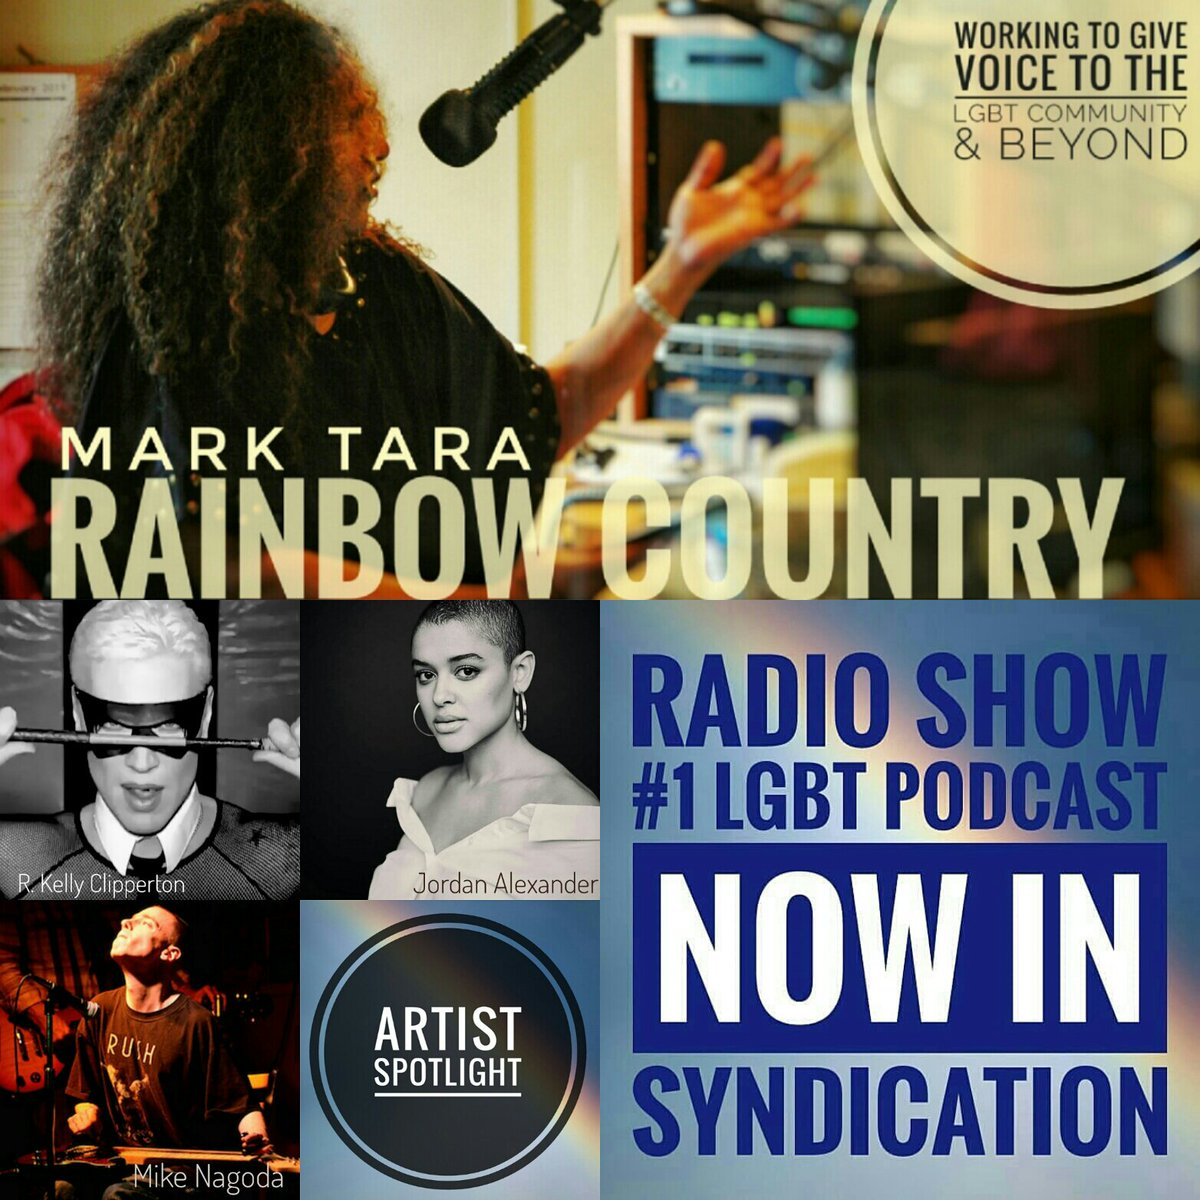 #RainbowCountry 5th Season LIVE TONIGHT EP 206 #ArtistSpotlight @RKClipperton @jordcalexander @mnagoda #GayPride @ColinHJohnson1 #Music @idreamdeep @VolleyPaul @djanddrums  8PM ET @Bombshell_Radio #Online 11PM ET @CIUT895FM #Toronto 8PM PT @CJUCFM #Whitehorsepic.twitter.com/qj6mYReRF8